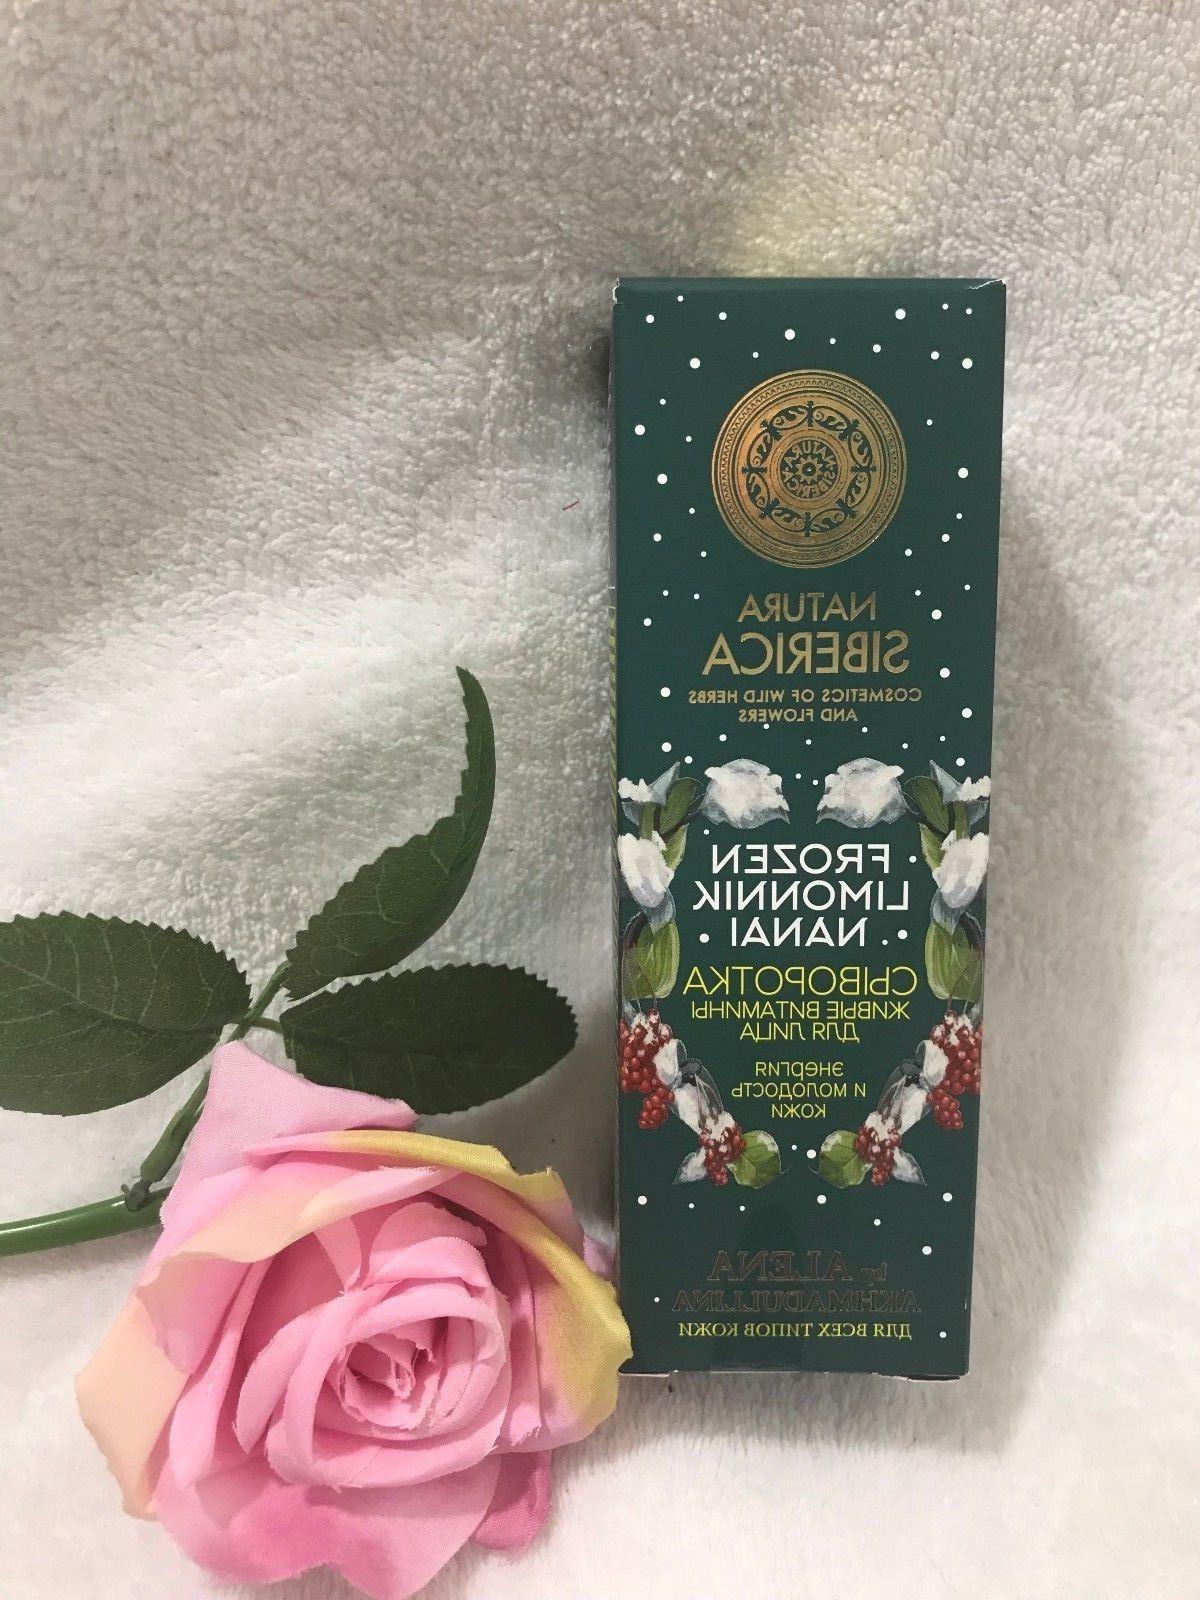 Natura Siberica Face Serum Limonnik Nanai Dry Skin Anti agin